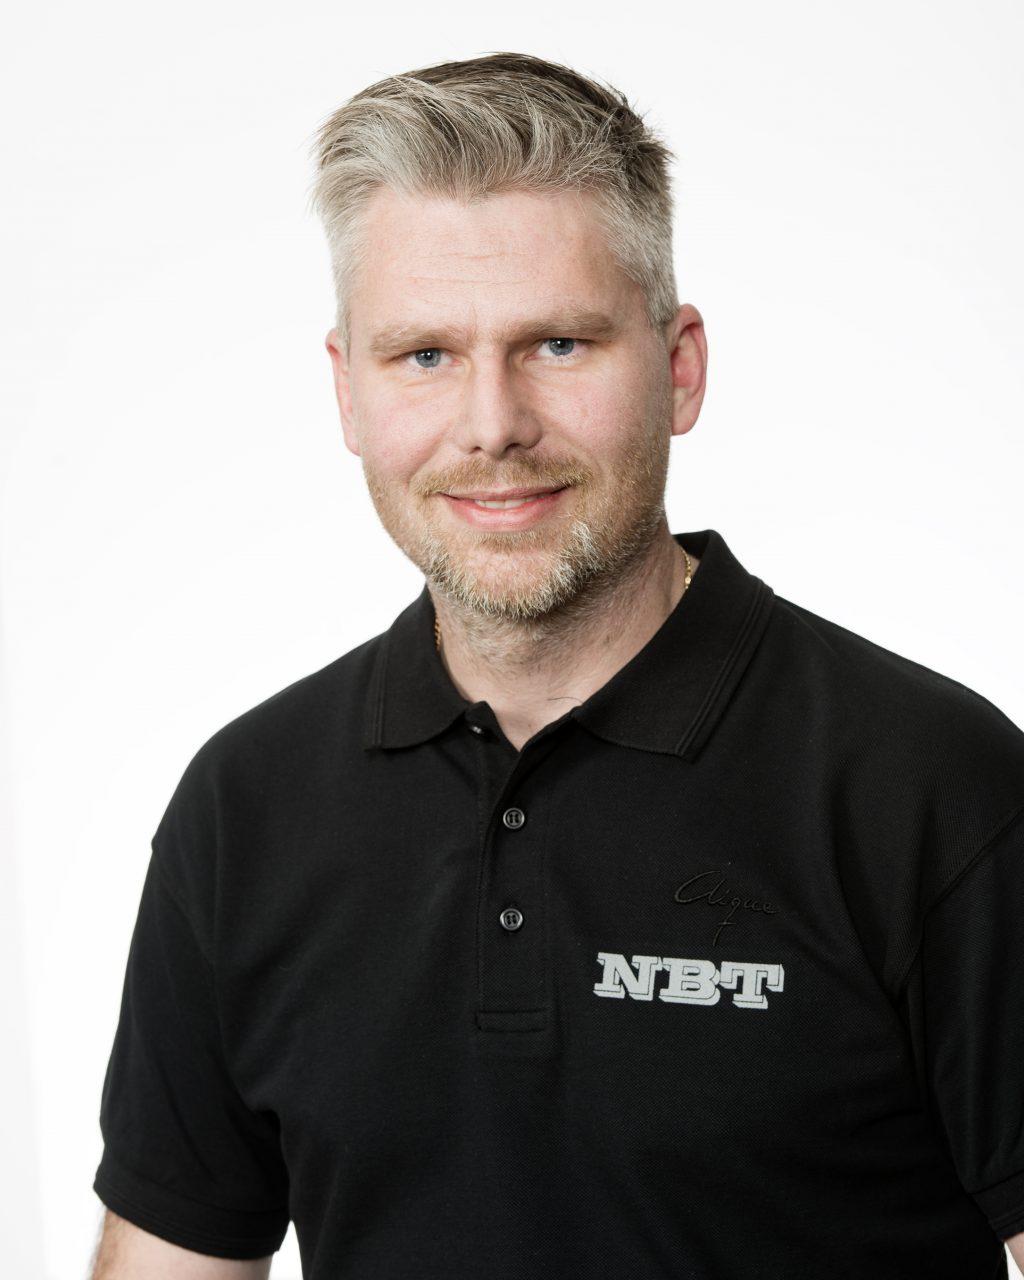 Johan Cederberg